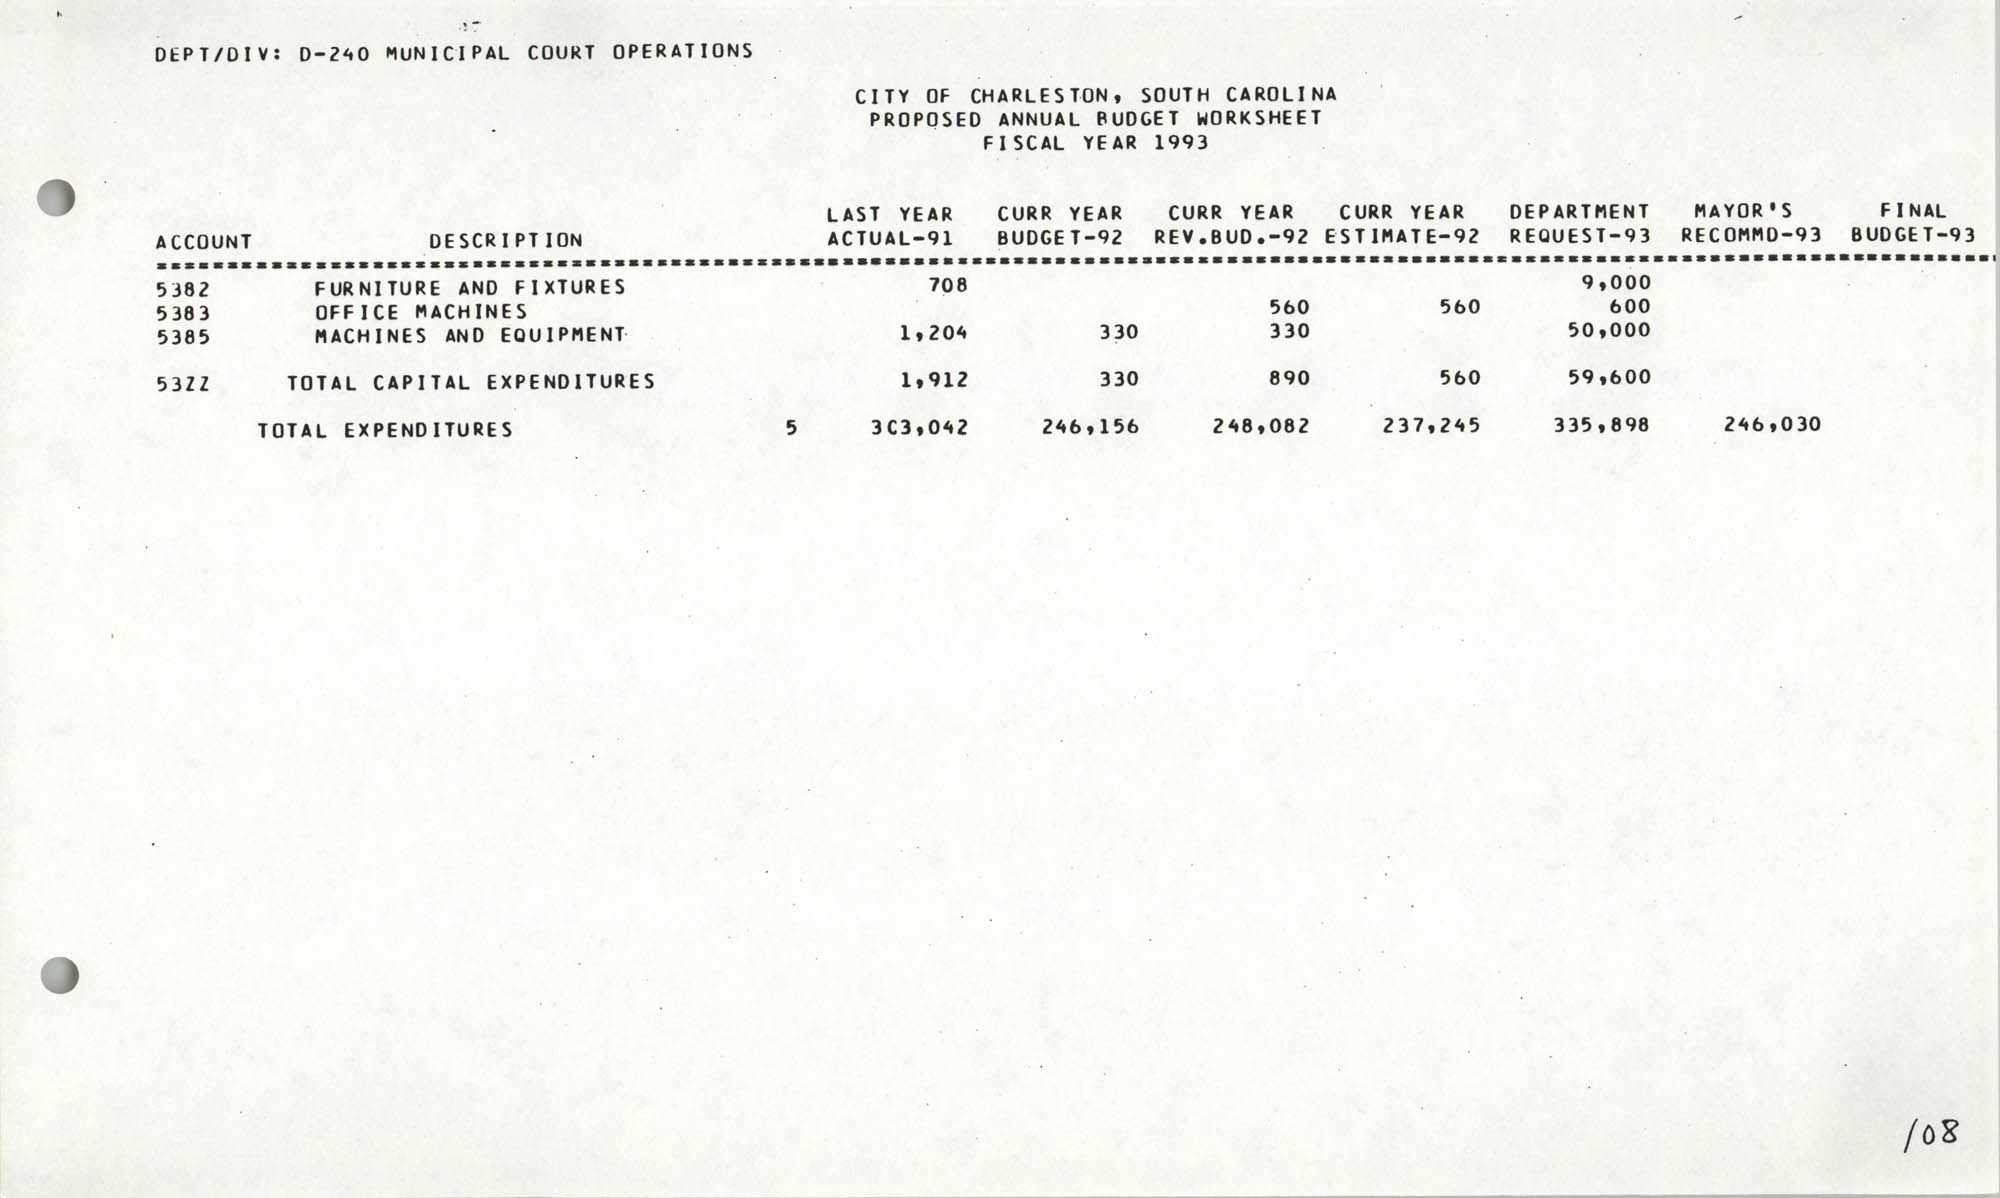 The City Council of Charleston, South Carolina, 1993 Budget, Page 108